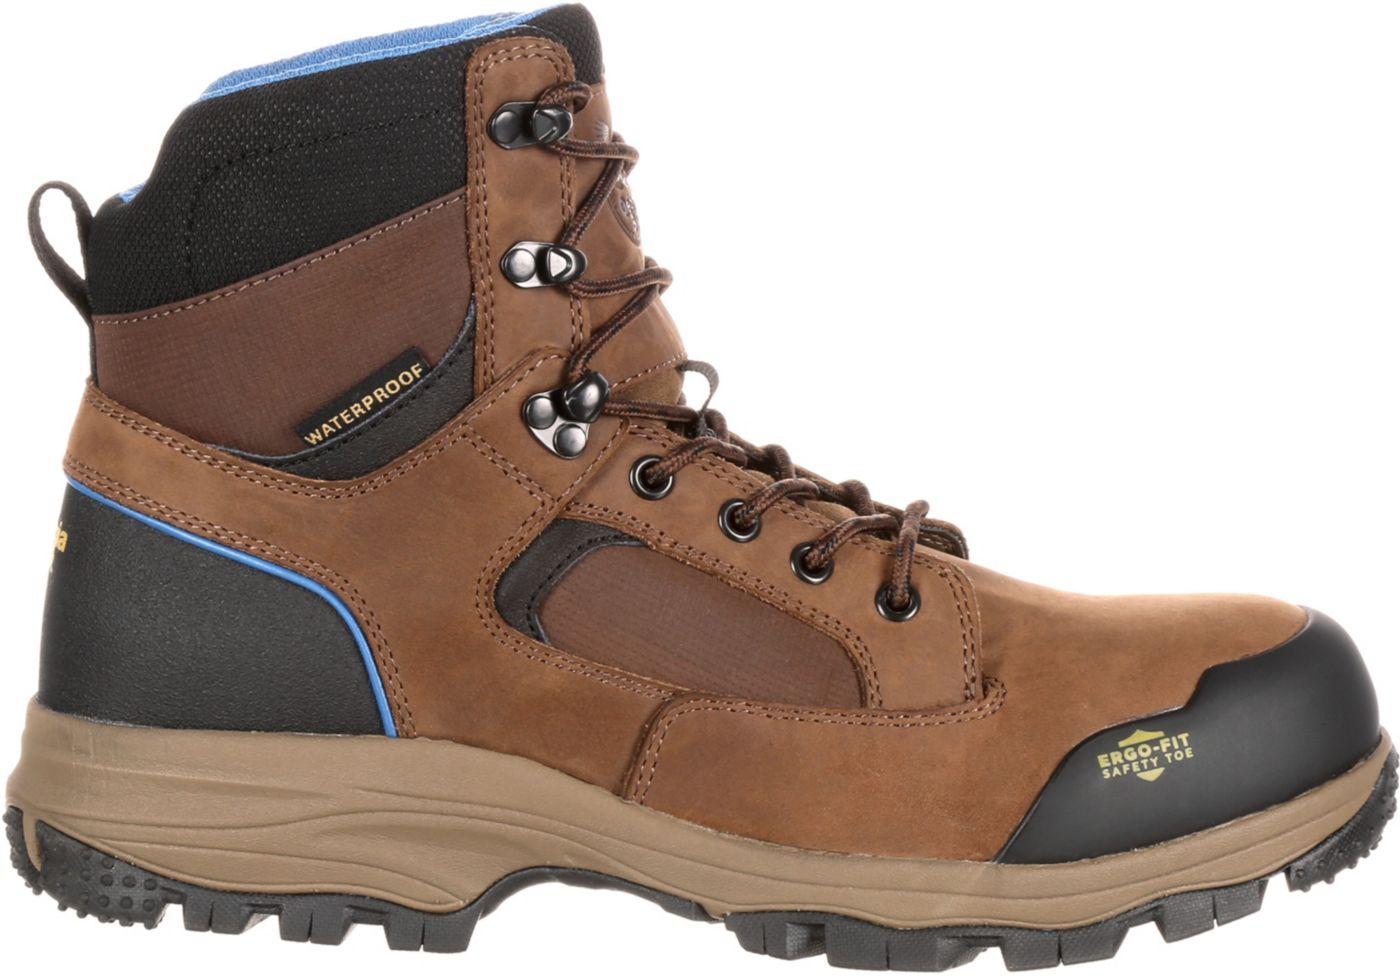 Georgia Boot Men's Blue Collar Hiker Waterproof Work Boots